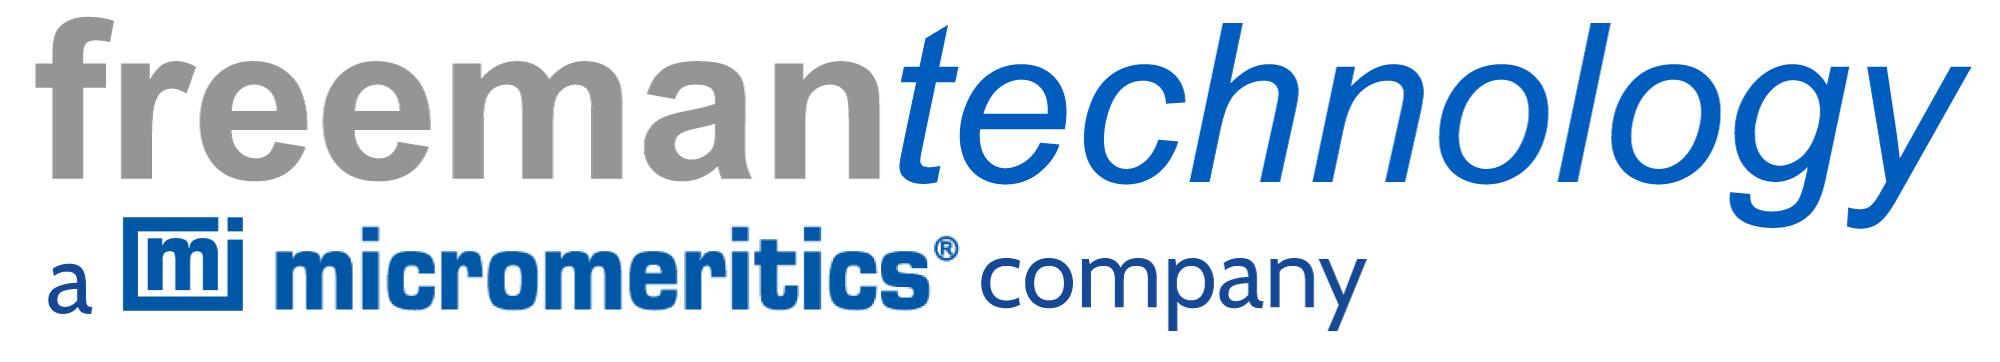 The Freeman Technology logo - The Freeman Technology logo